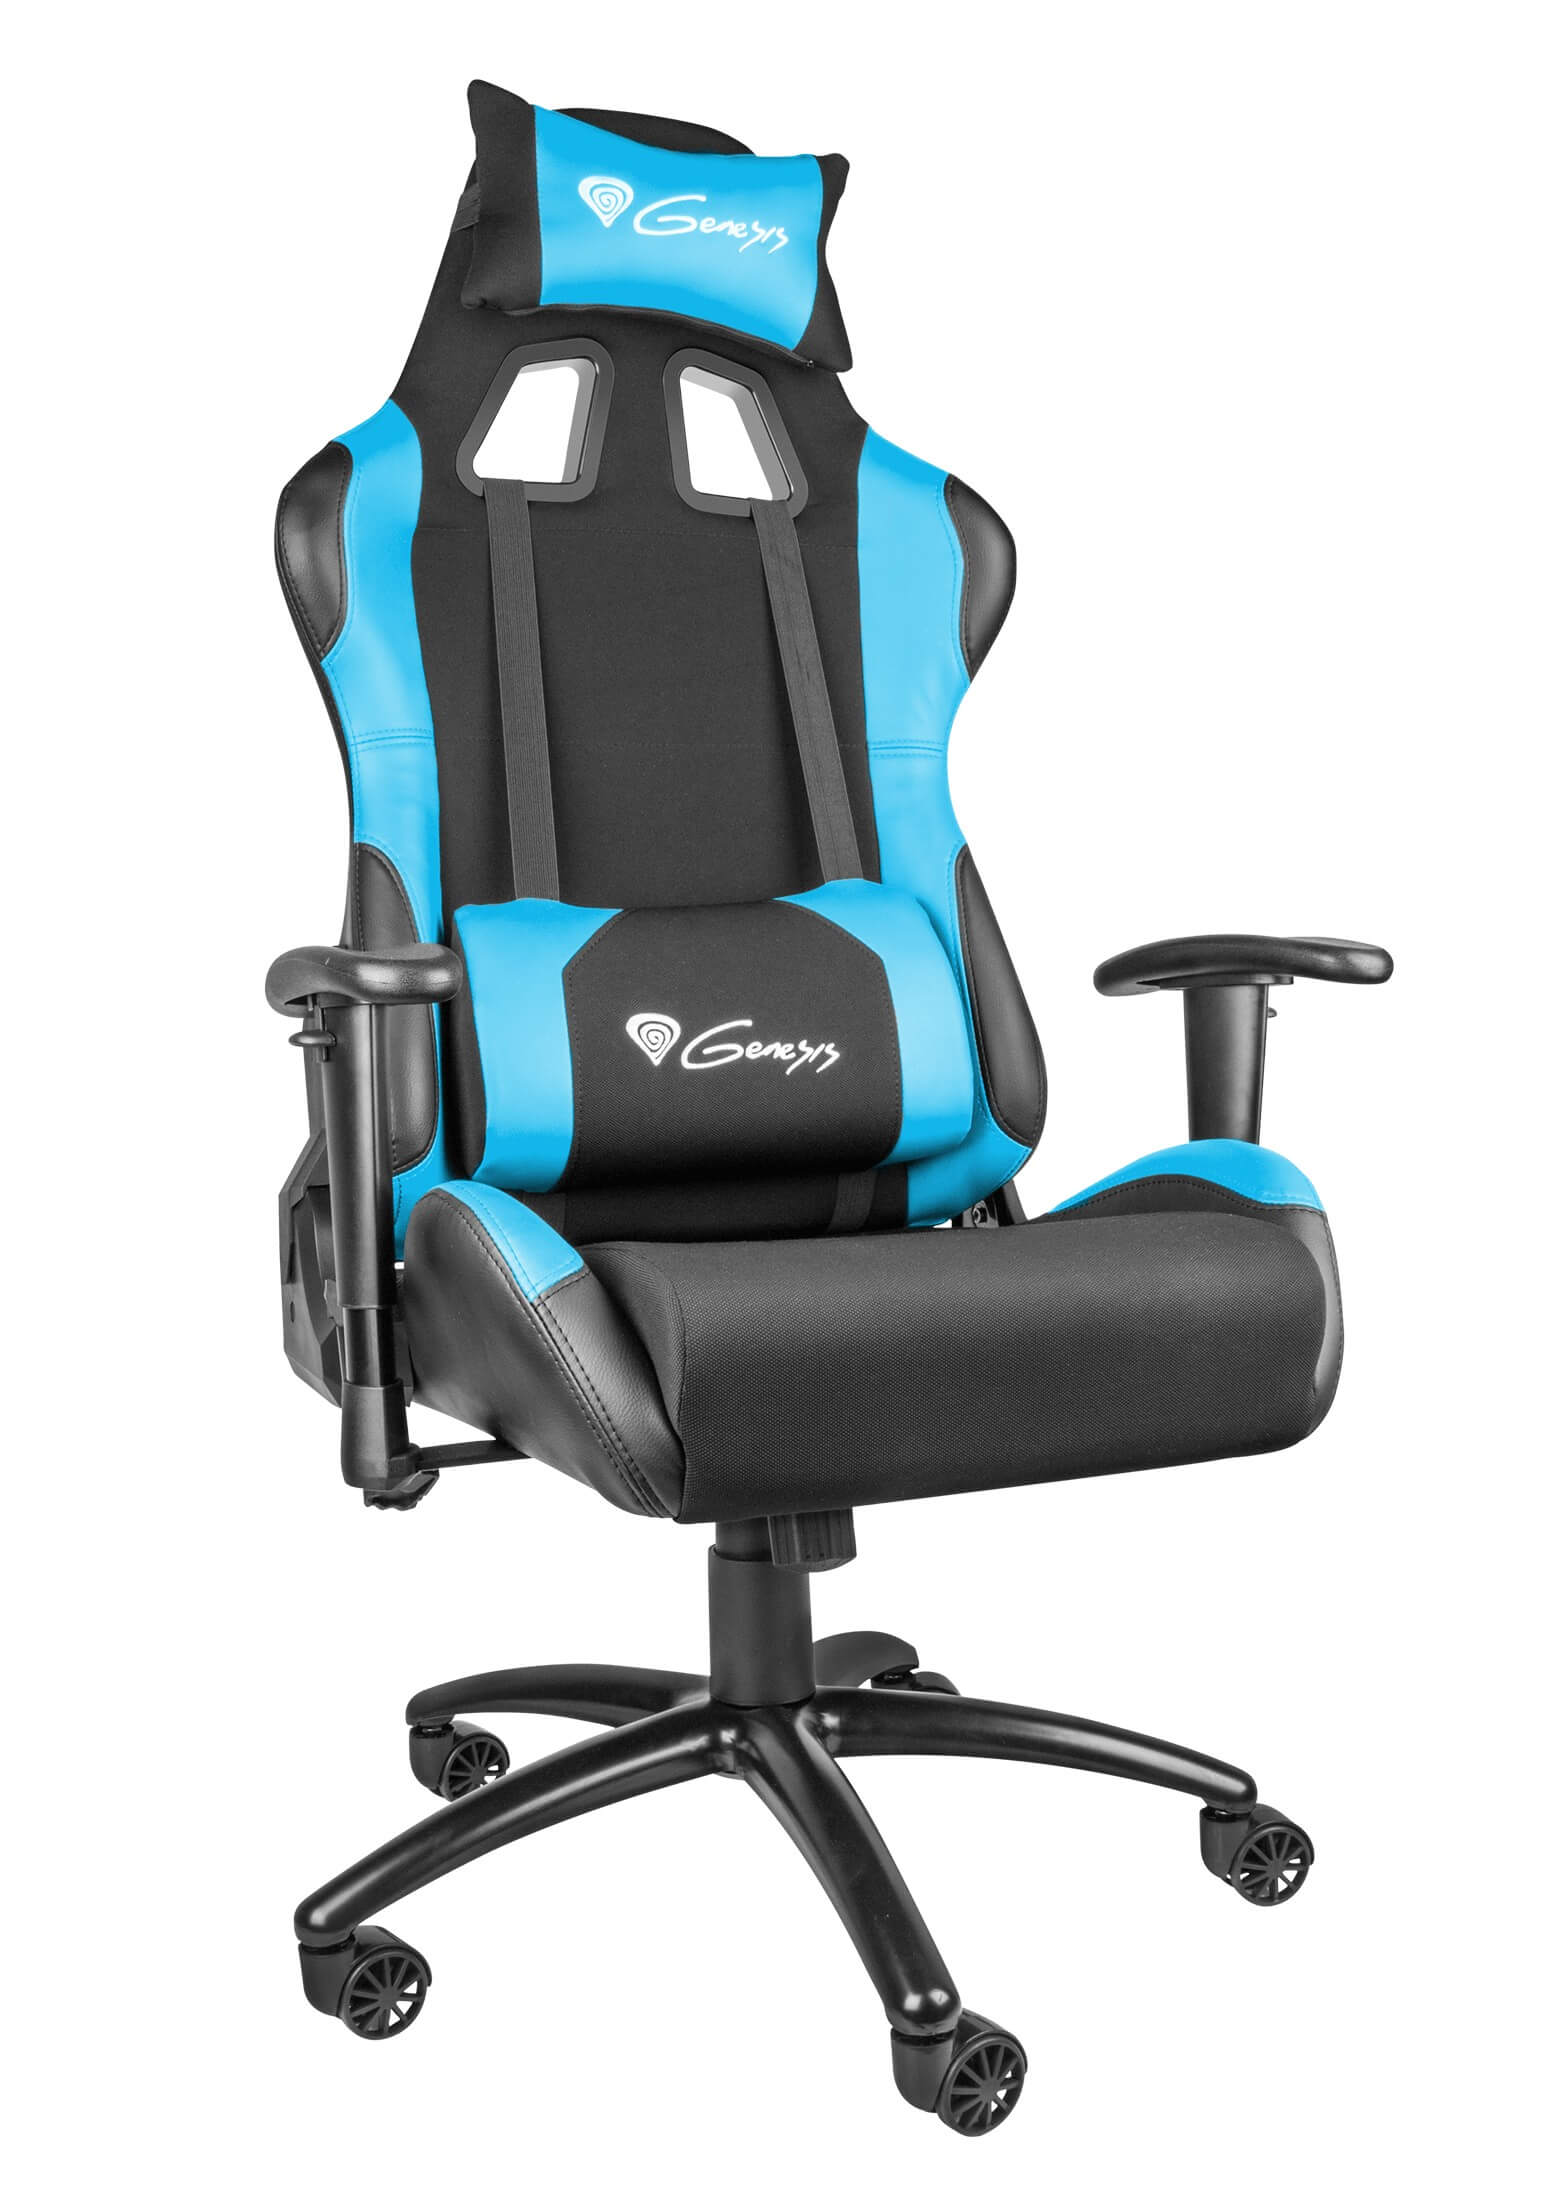 GAMING CHAIR GENESIS NITRO 550 BLACK-BLUE